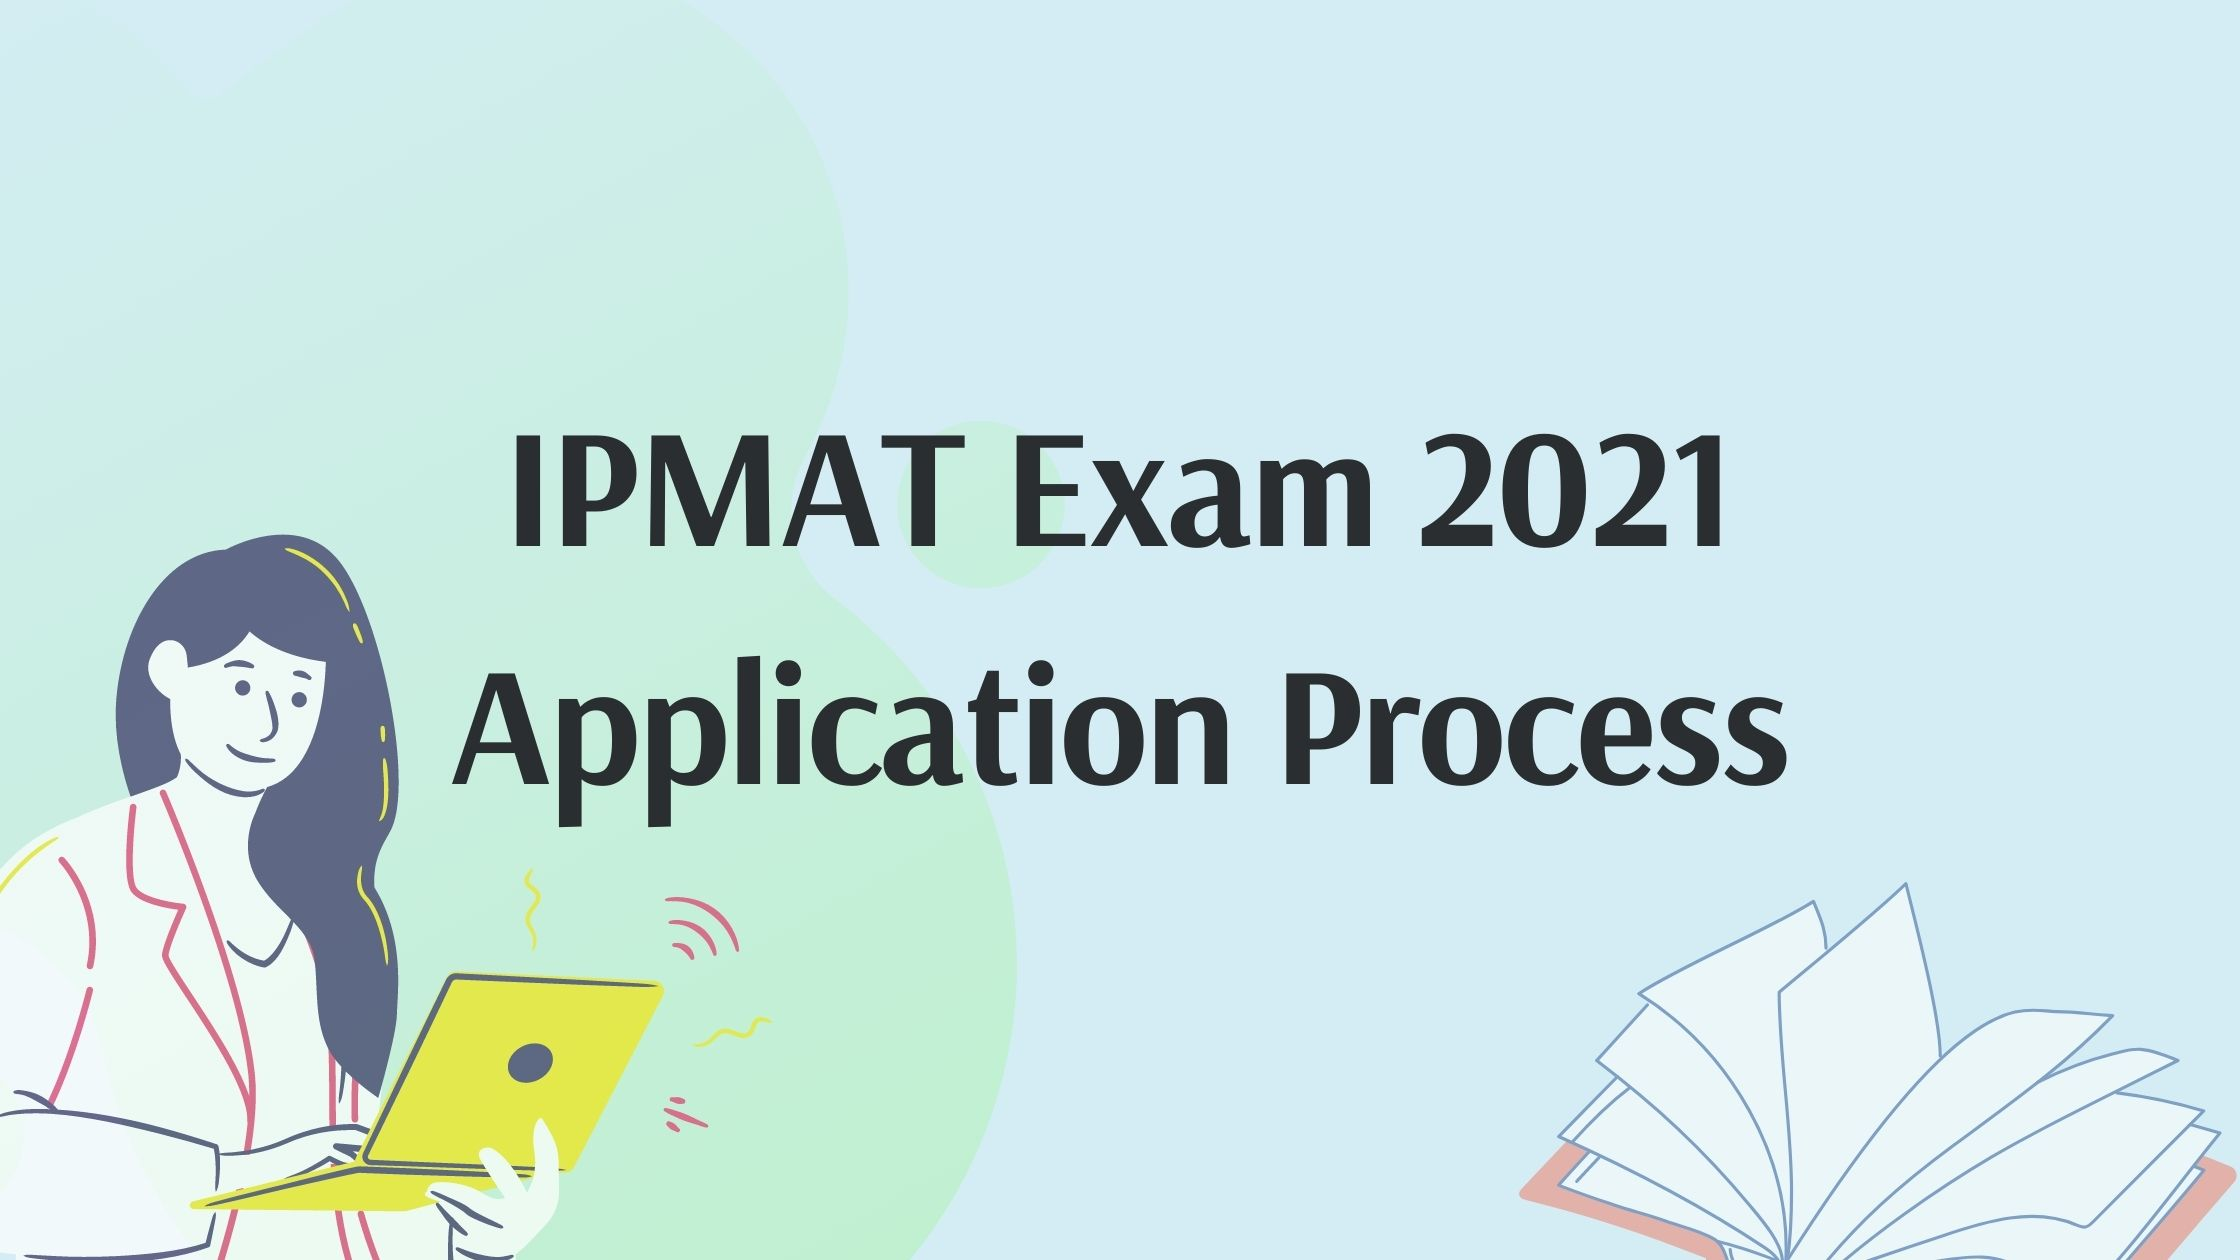 IPMAT Exam, IPMAT Admission, Ipmat registration, Ipmat registration dates, Ipmat application fee, Ipmat documents required / documents required for ipmat exam